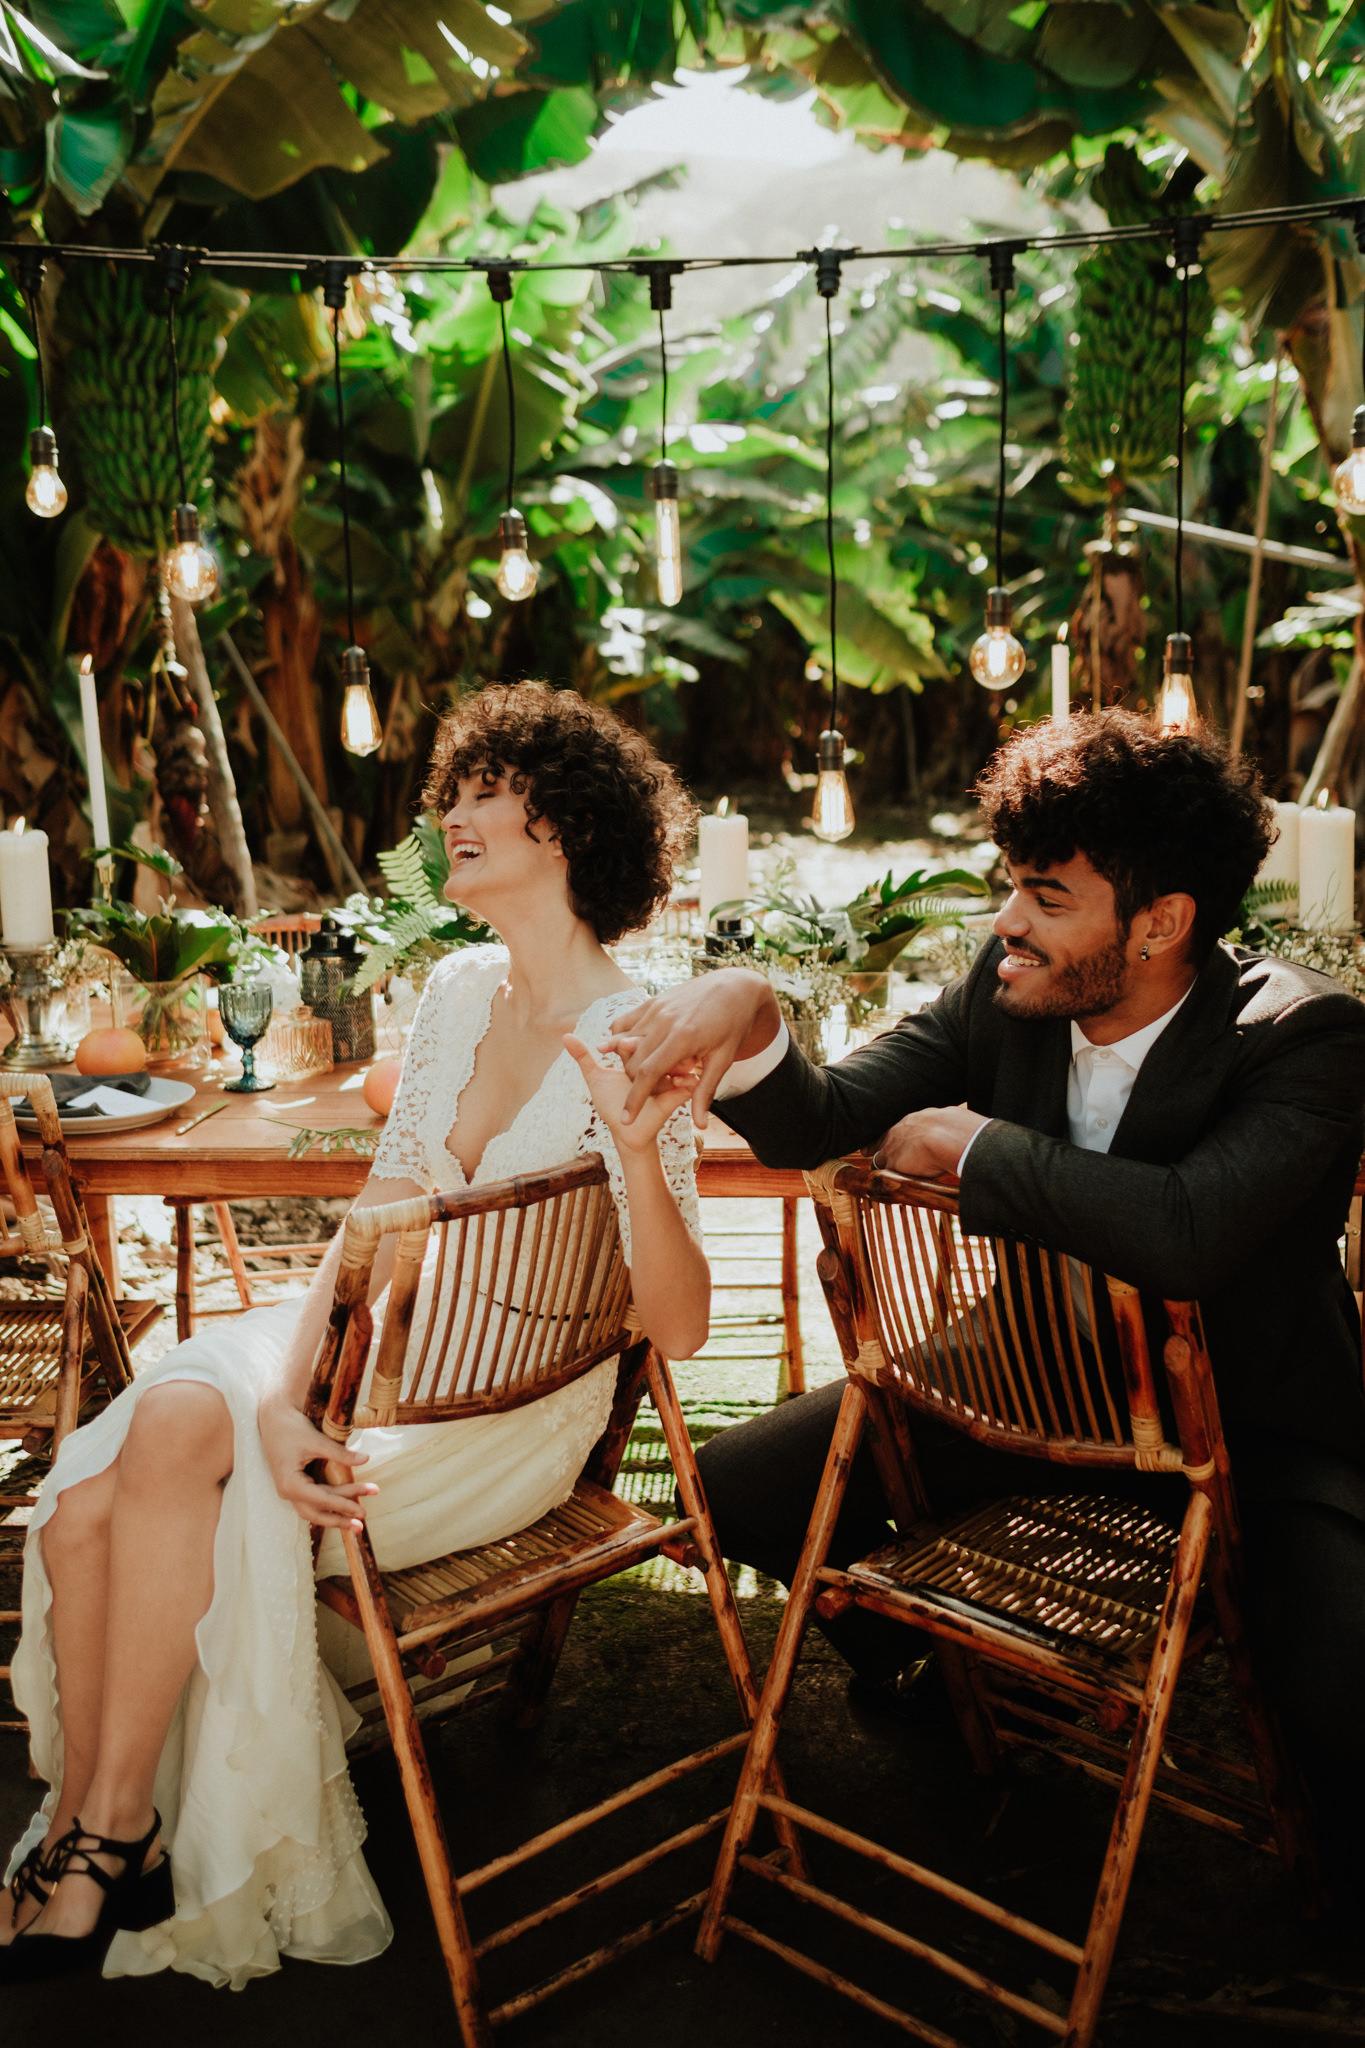 Fot grafo boda las palmas de gran canaria espa a don helen - Fotografo las palmas ...